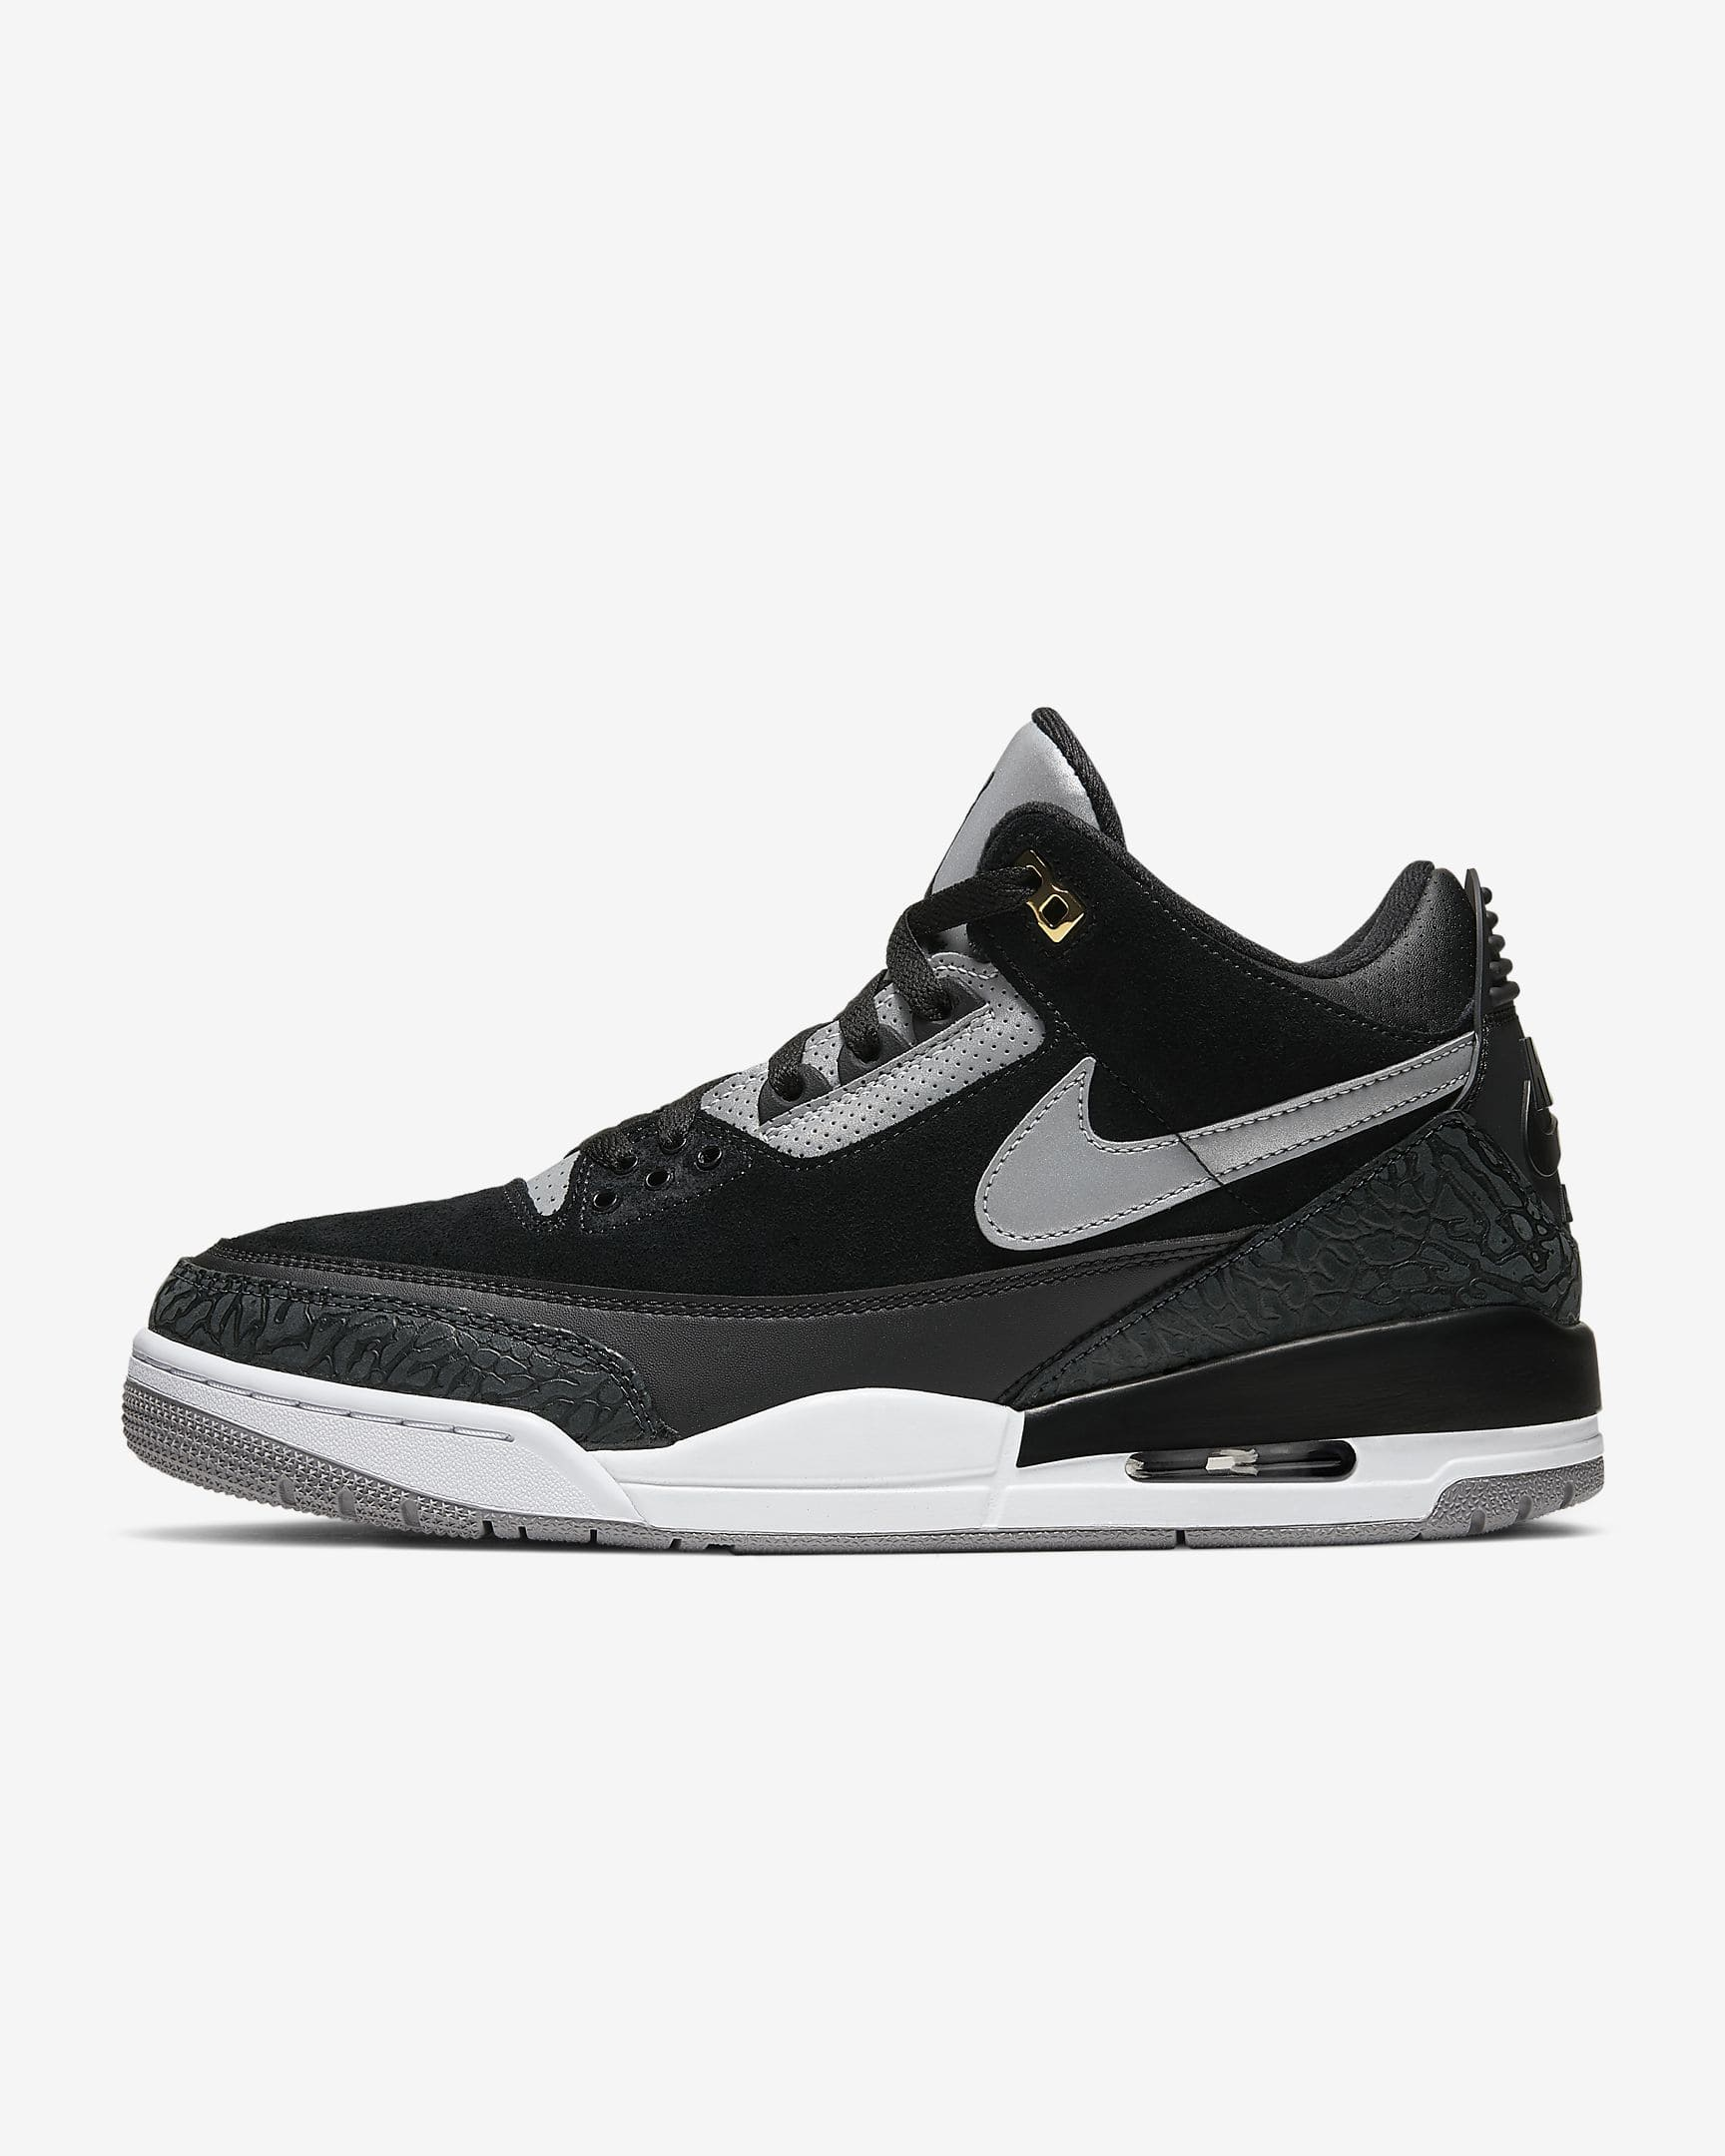 Jordan 3 Tinker Black/Cement Size 9.5-18 119.97 $119.97